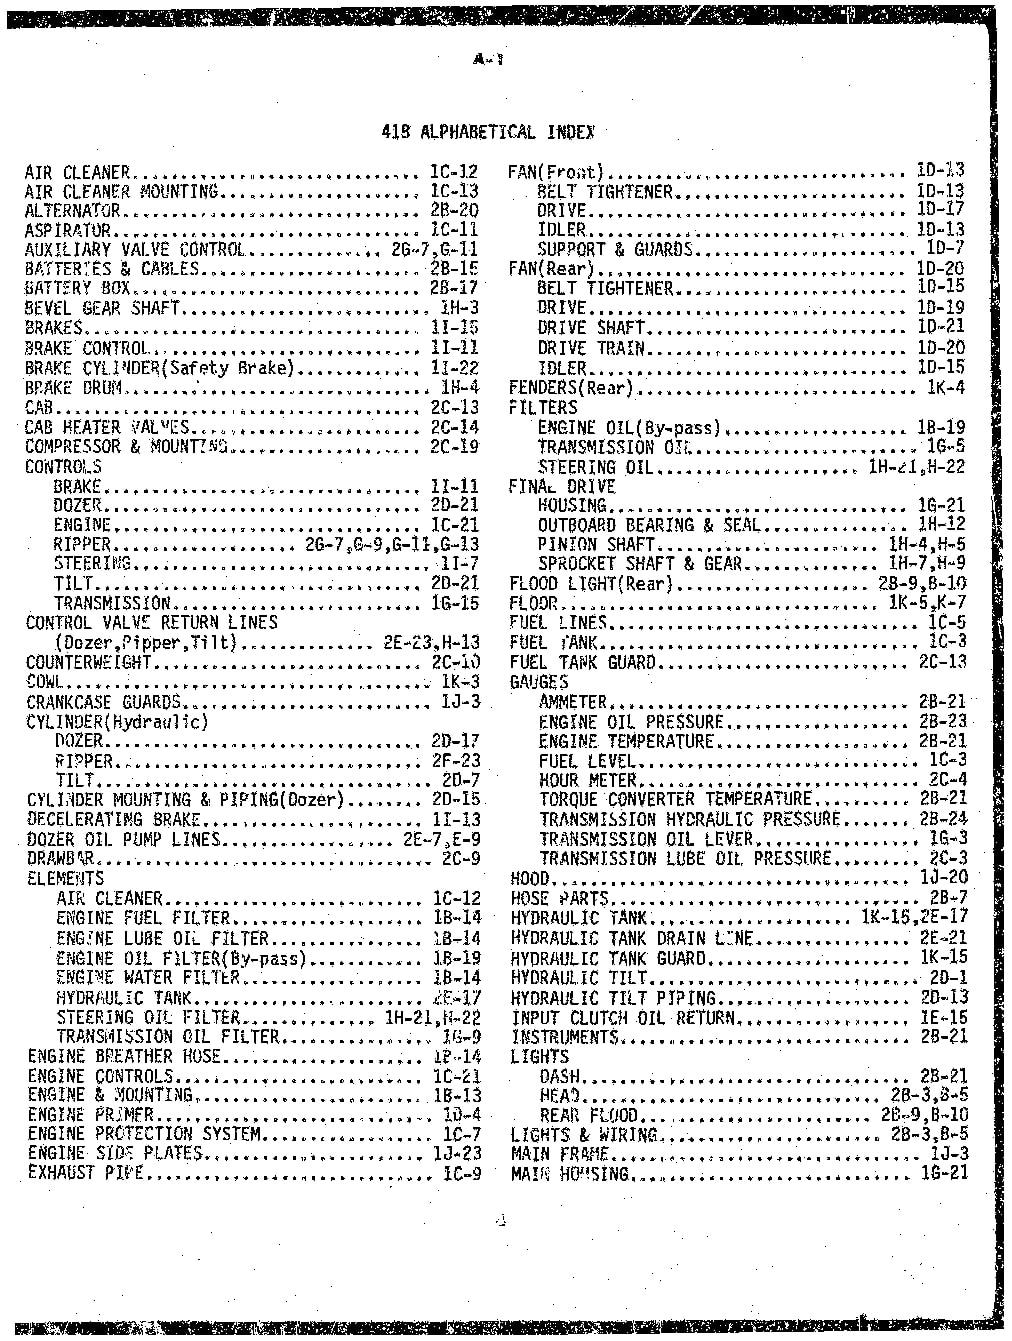 ALLIS CHALMERS FIATALLIS 41B pca-1.201 CRAWLER DOZER Parts